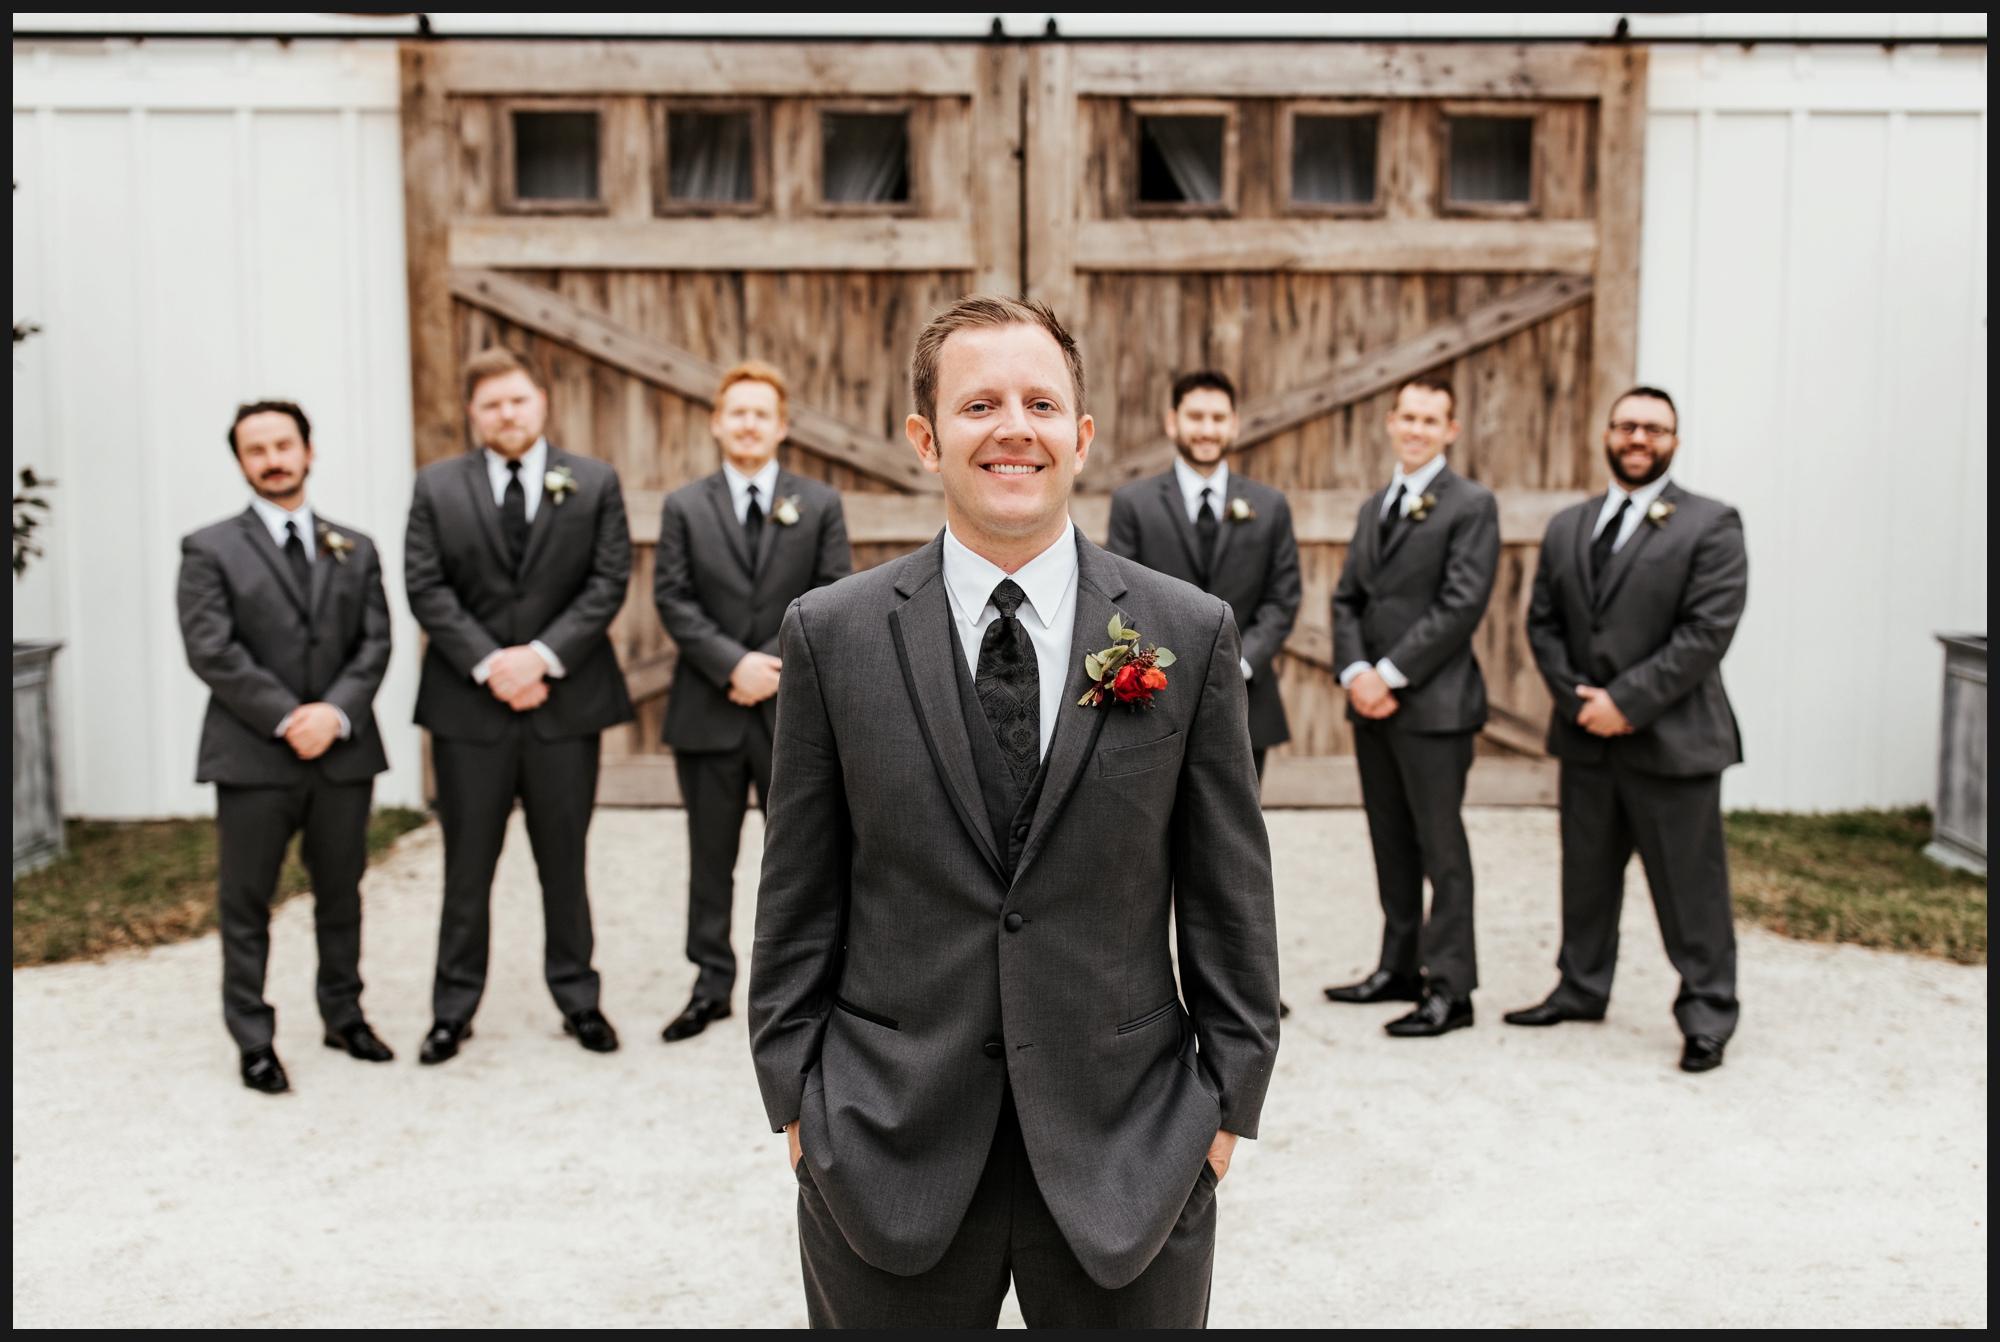 Orlando-Wedding-Photographer-destination-wedding-photographer-florida-wedding-photographer-hawaii-wedding-photographer_0516.jpg